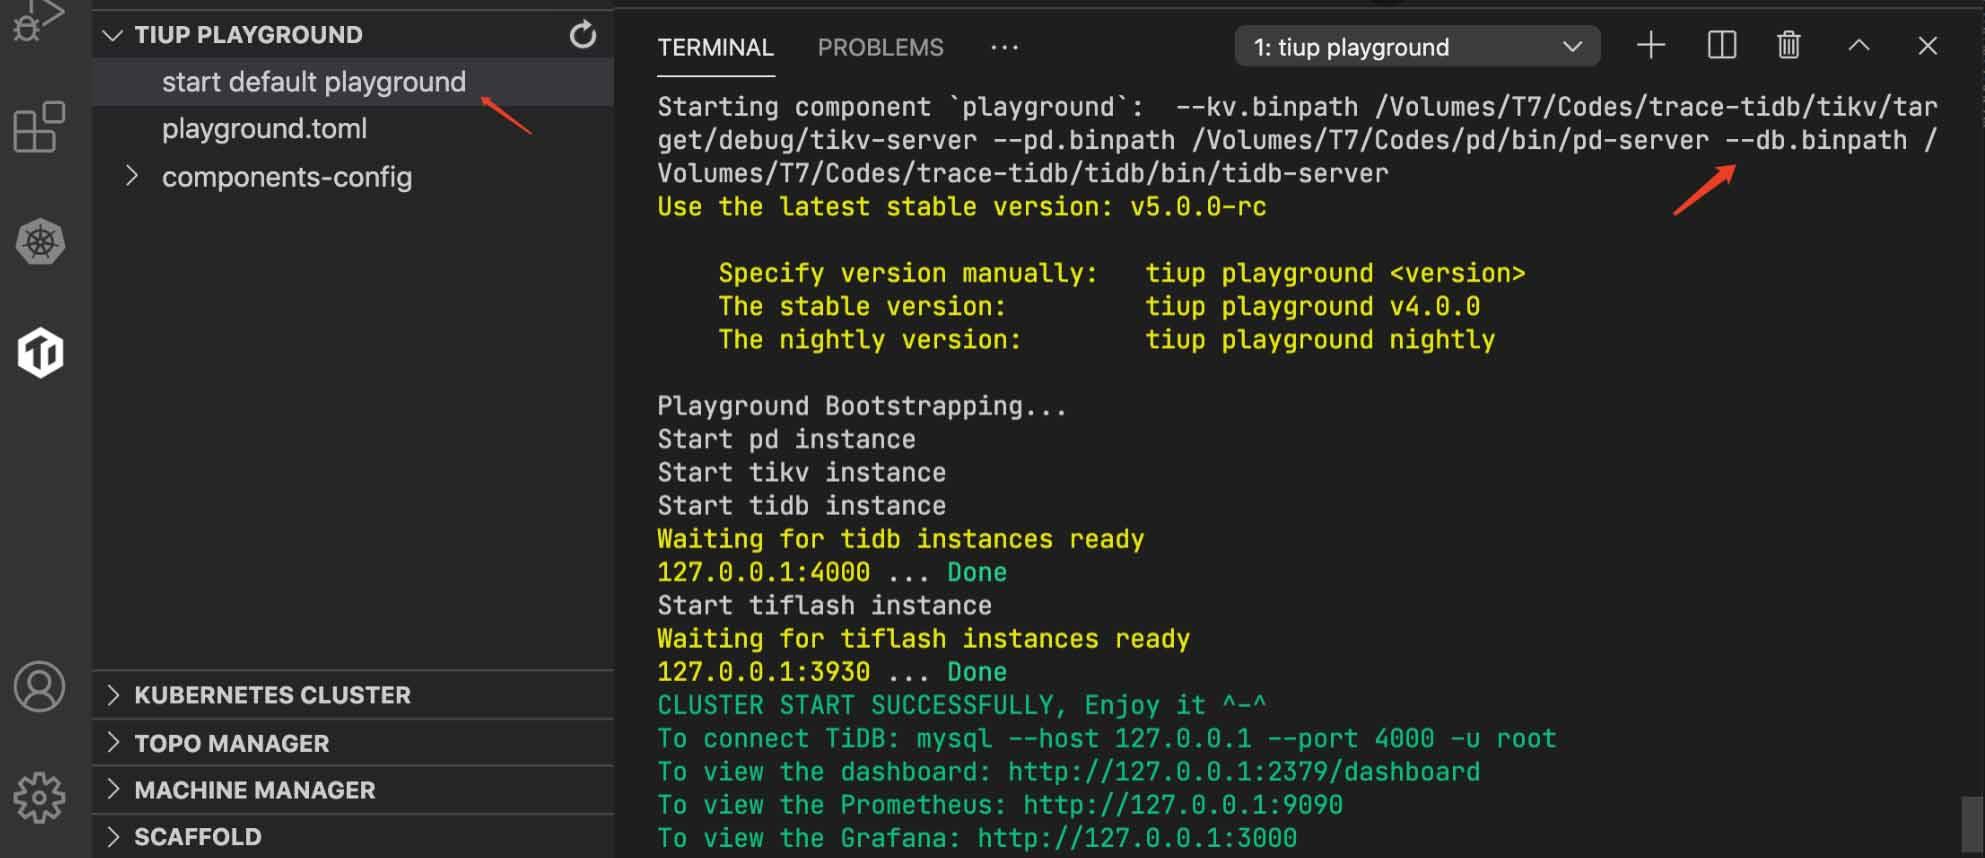 Deploy a testing cluster in TiDE